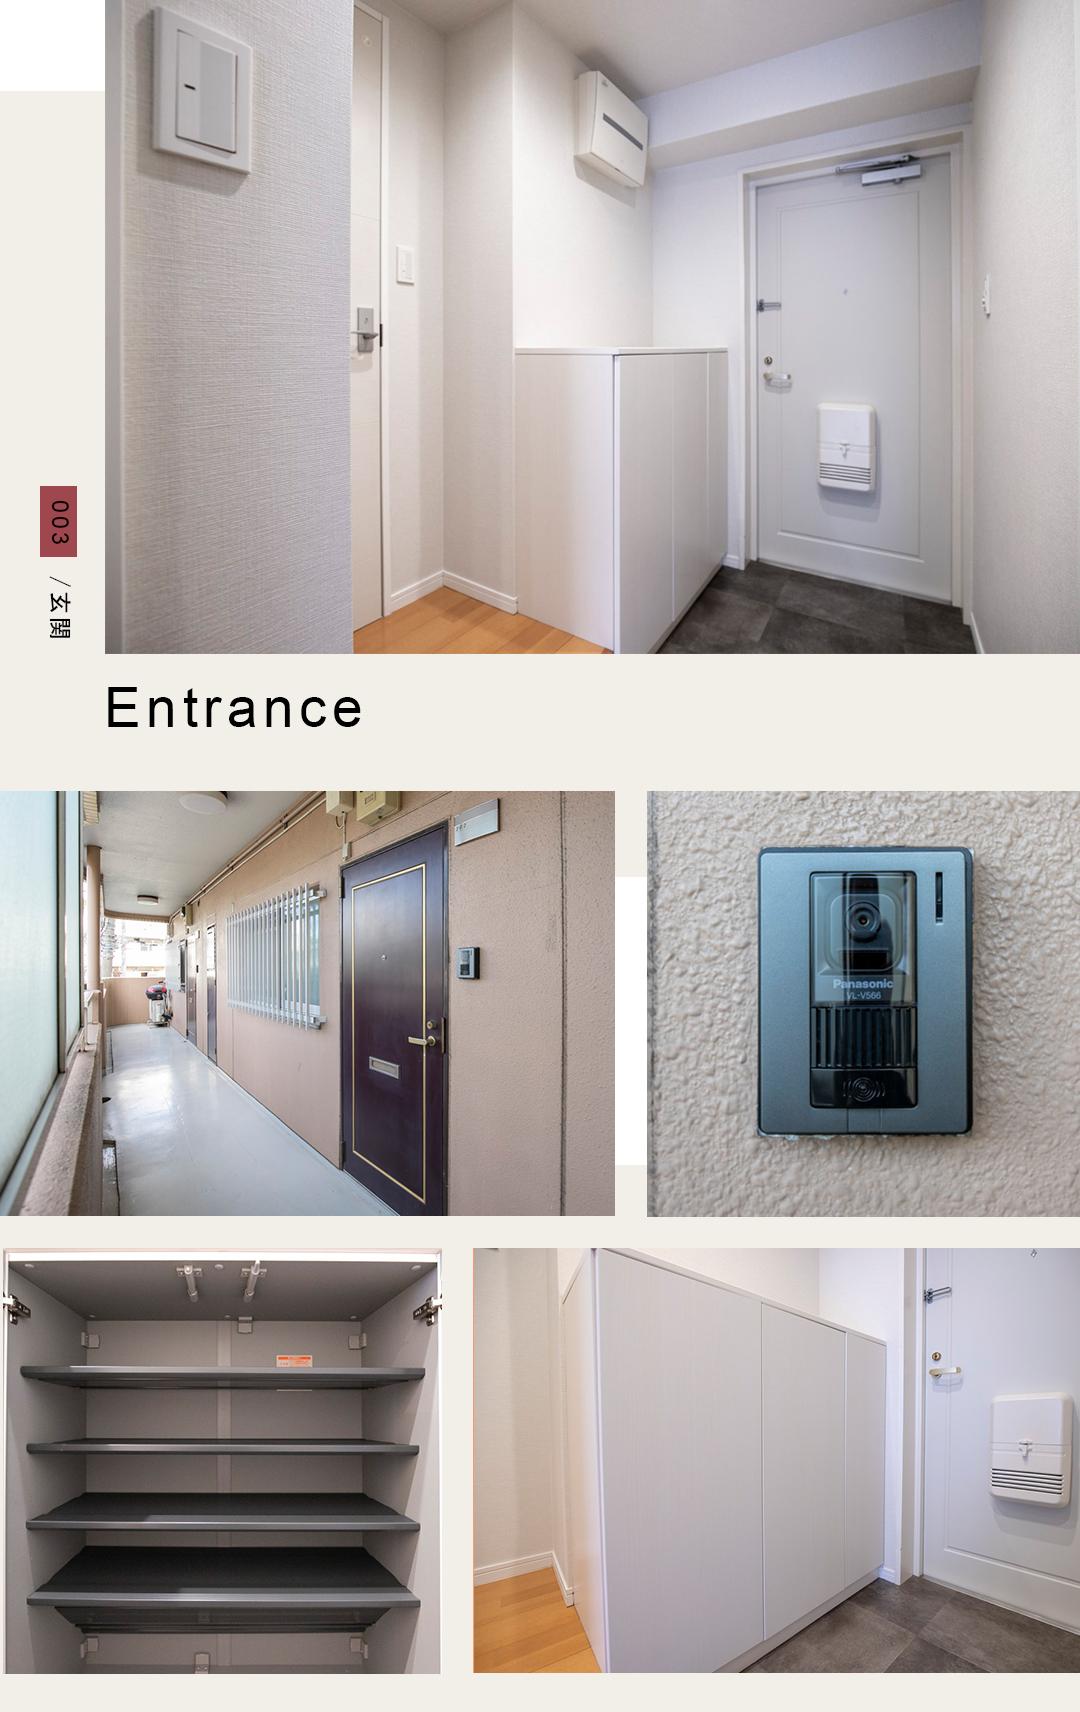 003,Entrance,玄関,,,,,,,,